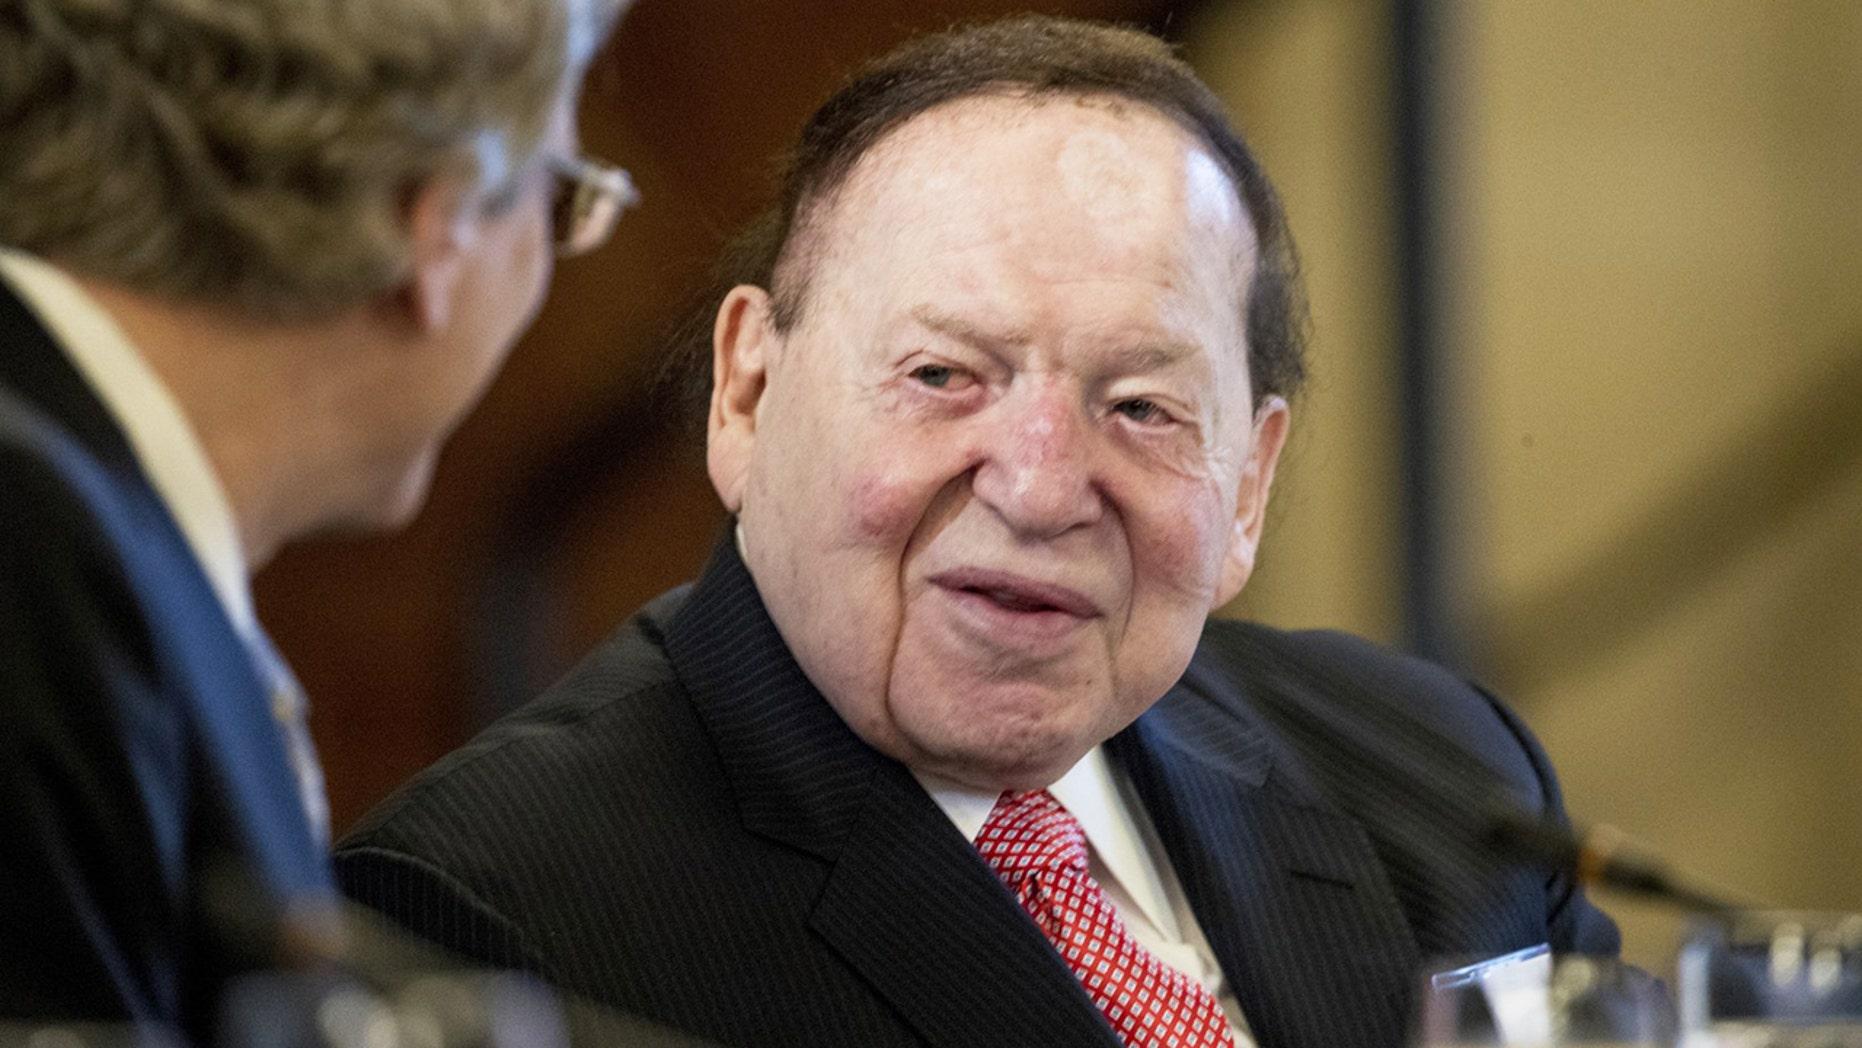 Las Vegas Sands Corporation CEO Sheldon Adelson (AP Photo / Andrew Harnik, file)